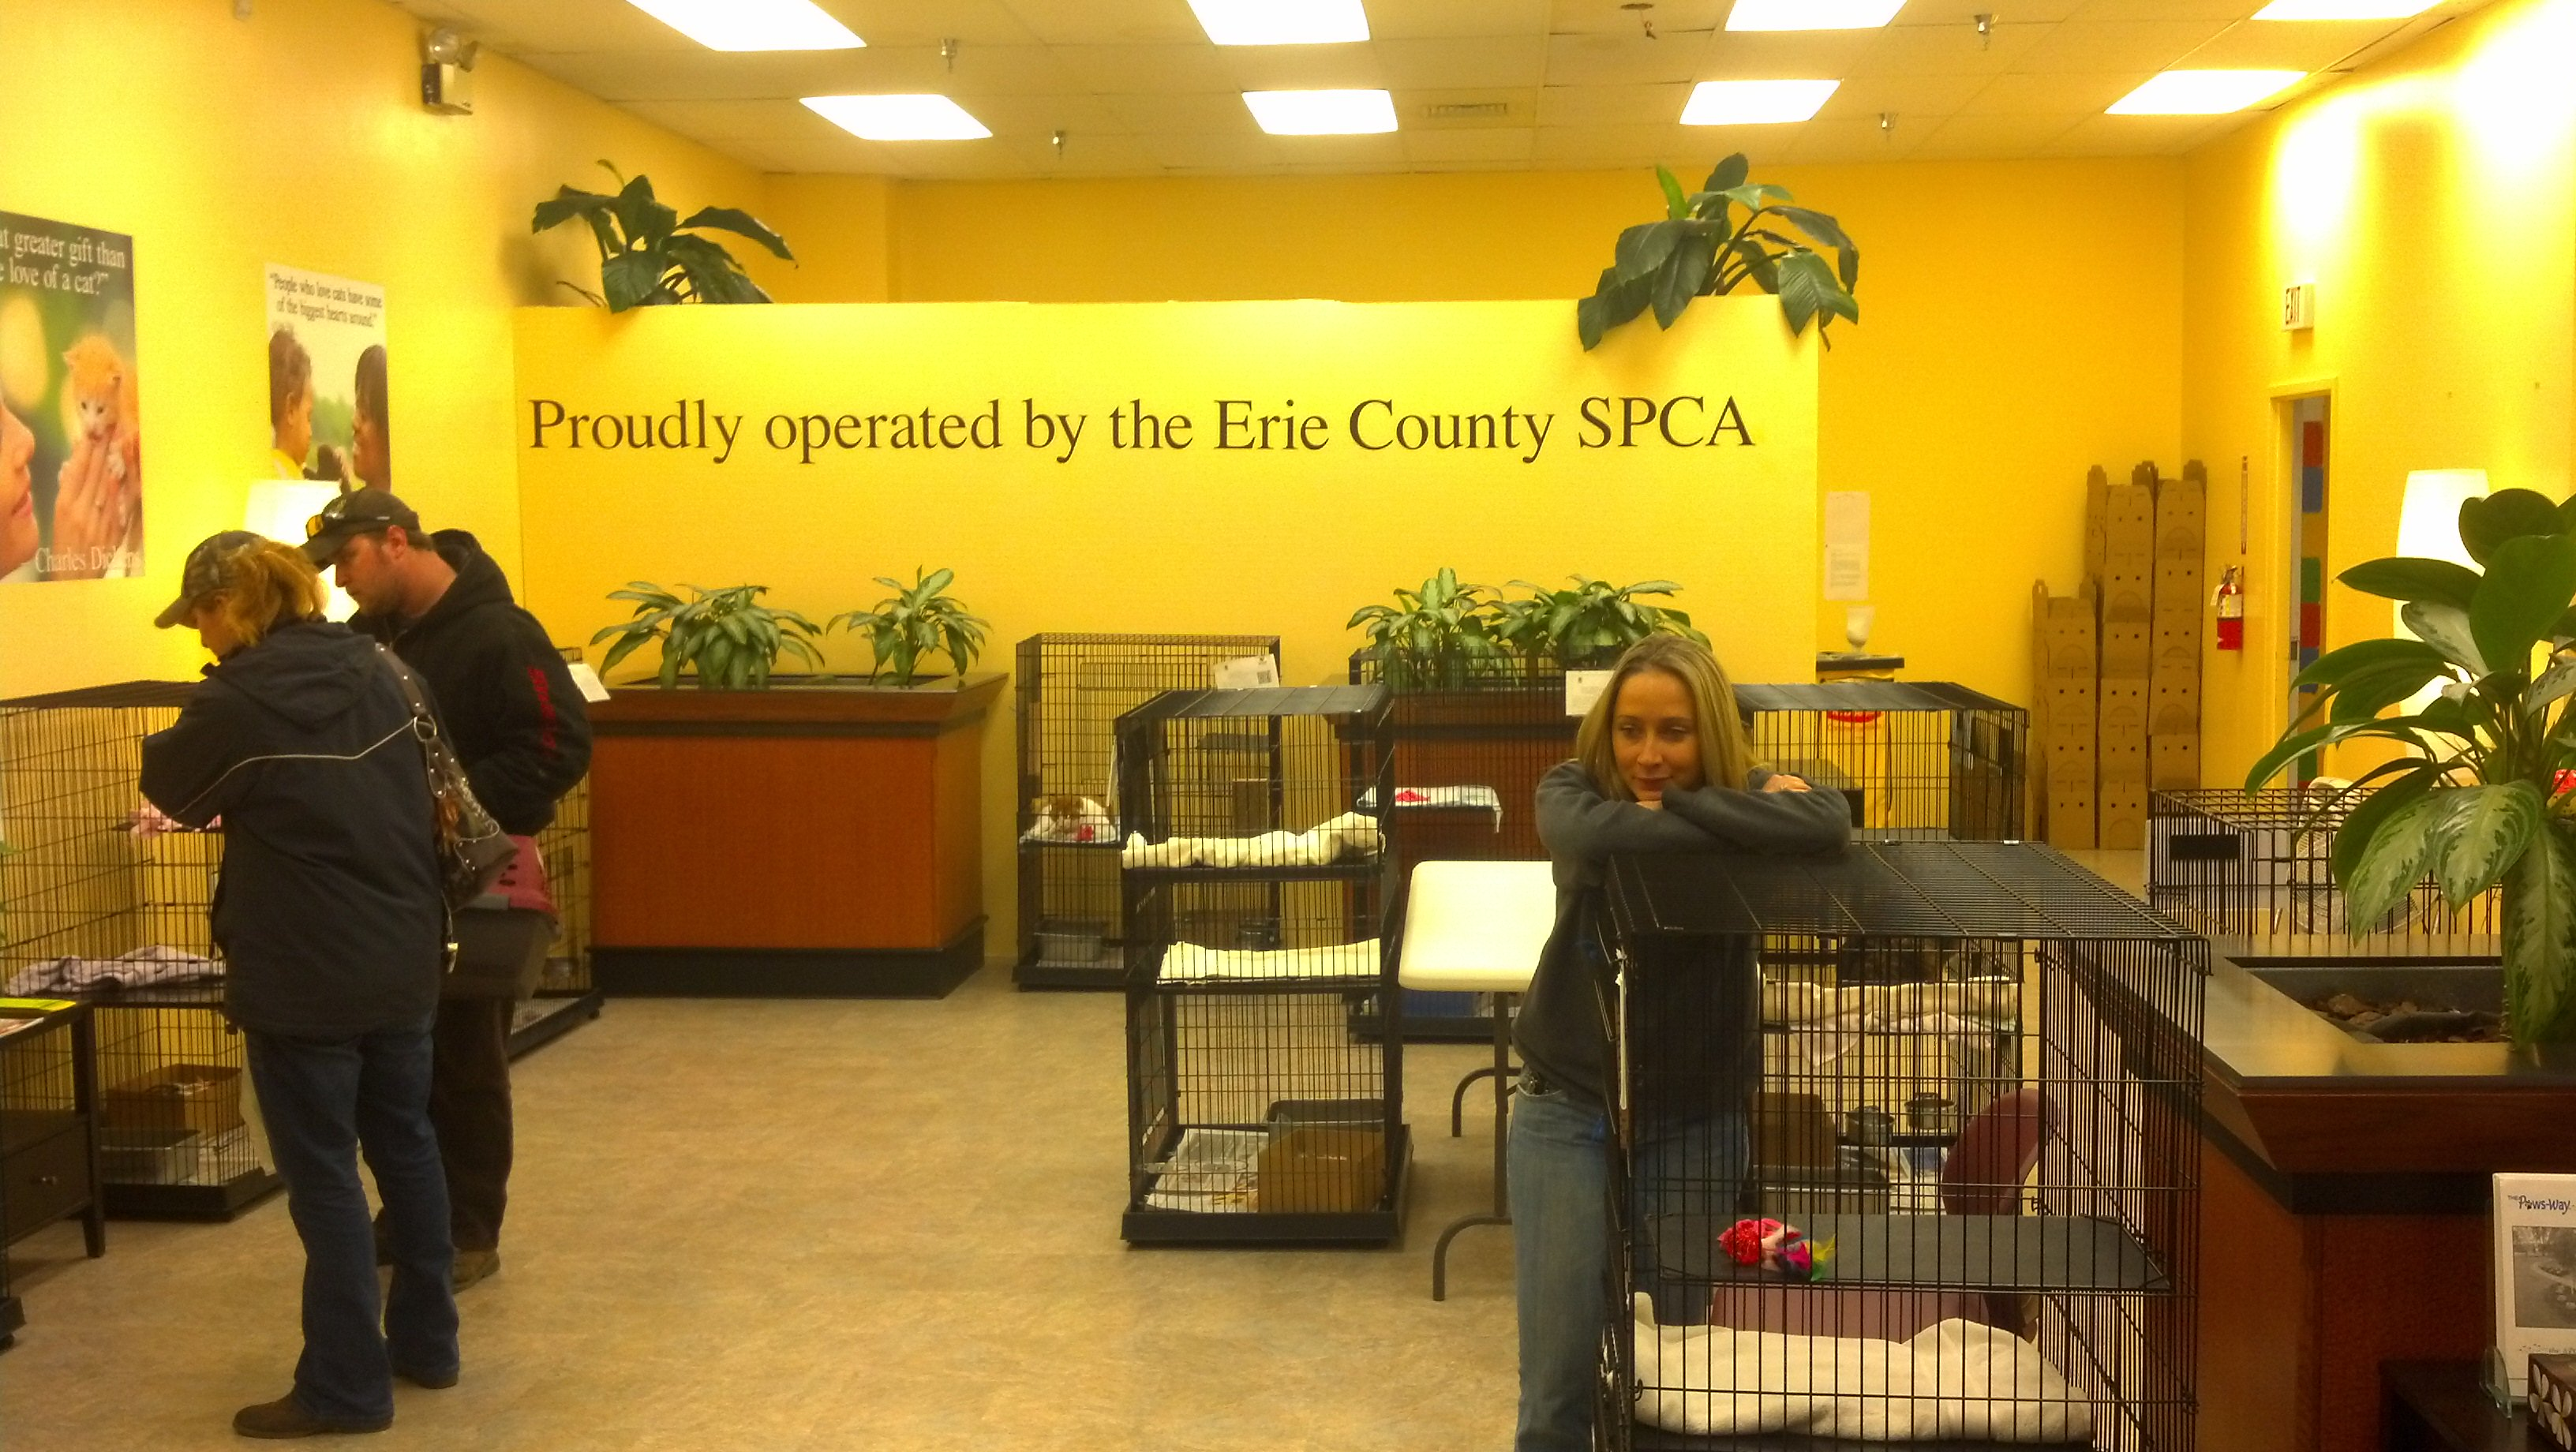 County Spca Erie 4545 Transit Rd Ste 850, Buffalo, NY 14221